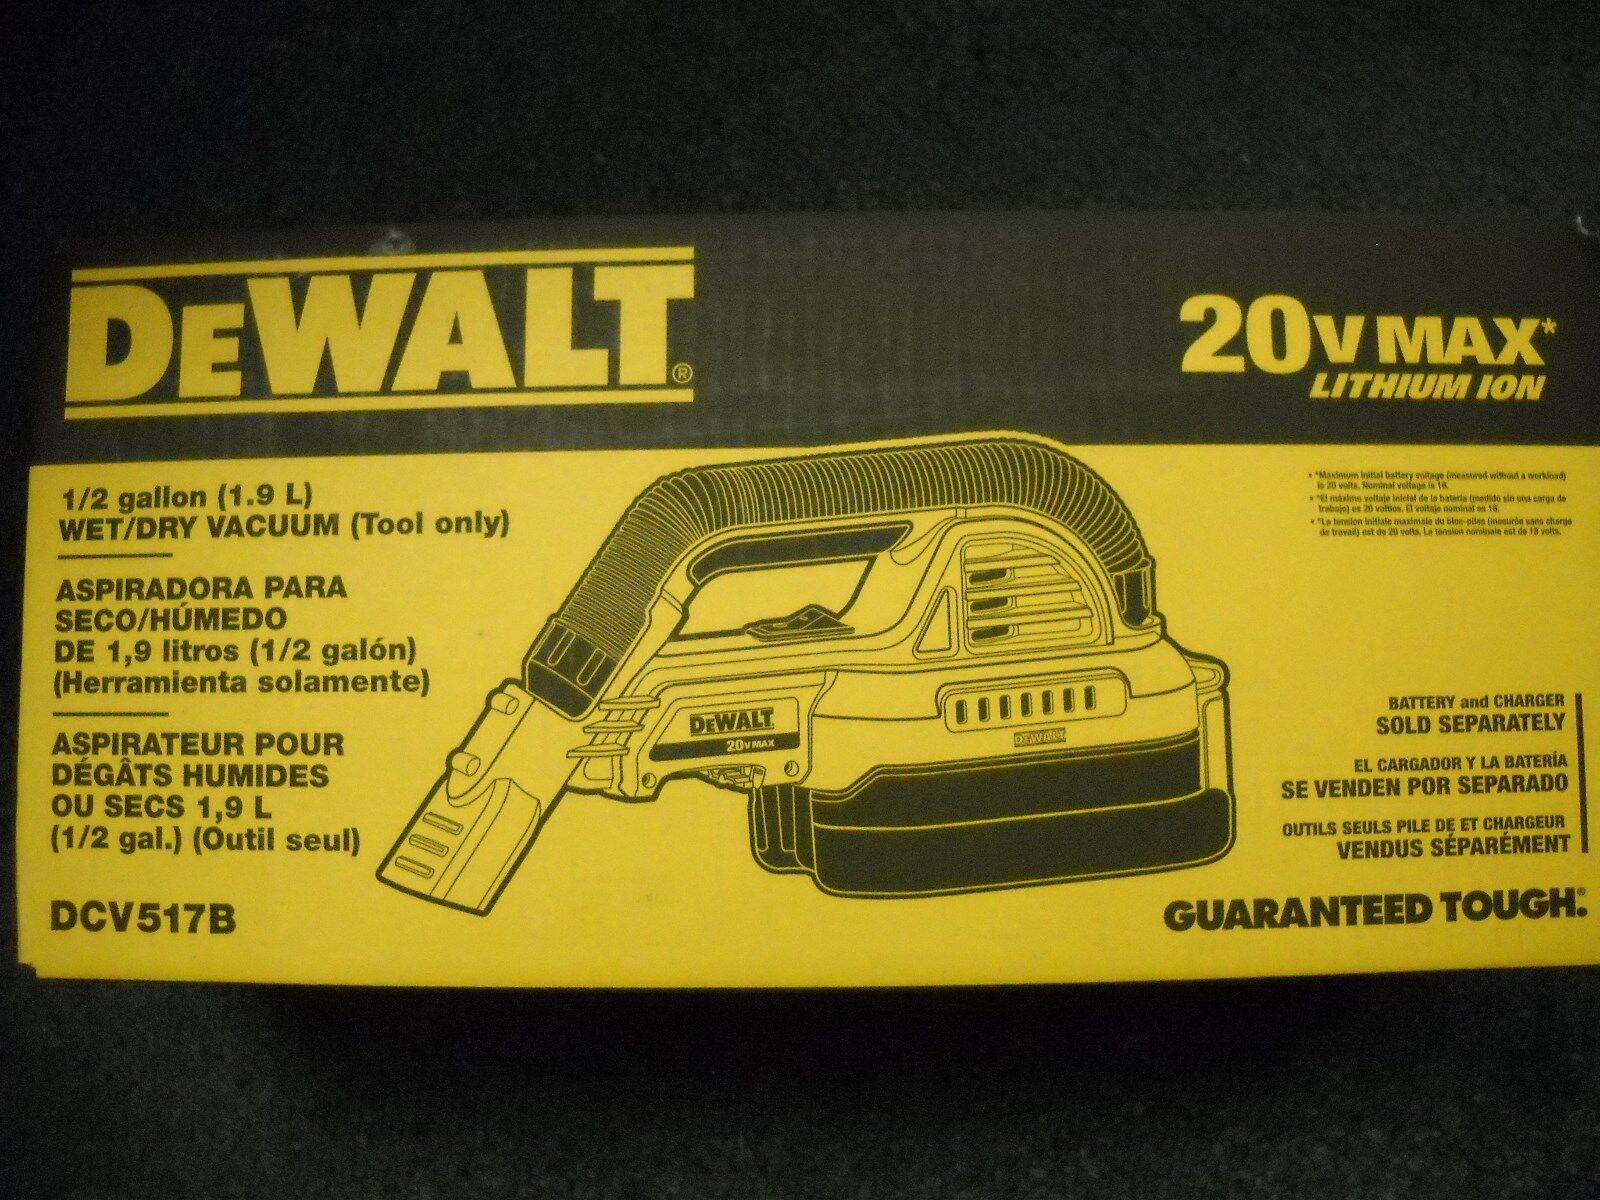 DeWALT DCV517B 20-Volt 1/2-Gallon Wet/Dry Portable Cordless